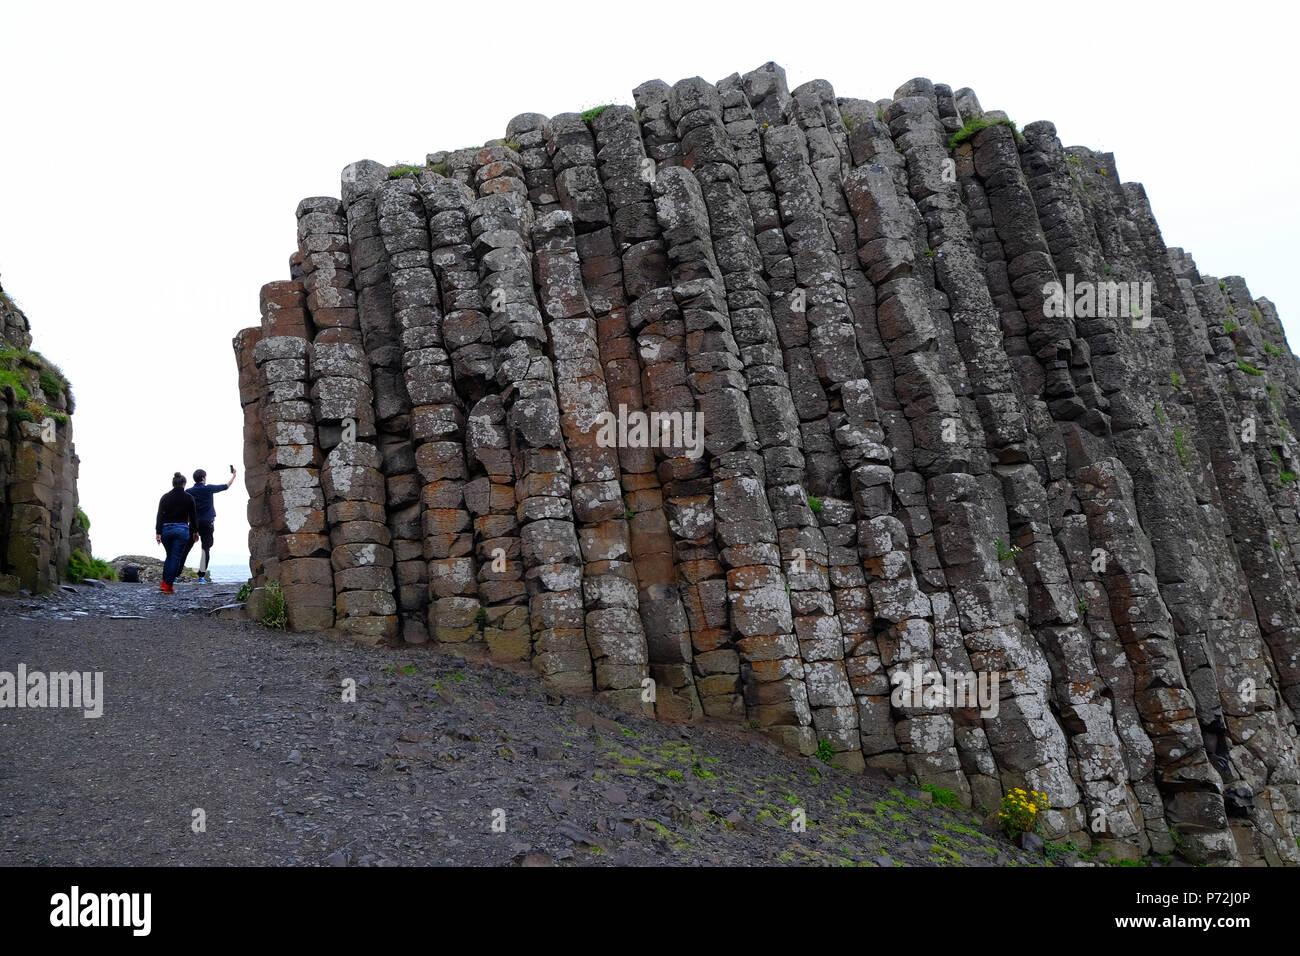 Giant's Causeway, UNESCO World Heritage Site, Bushmills, County Antrim, on the north coast of Northern Ireland, Ulster, Northern Ireland, UK - Stock Image